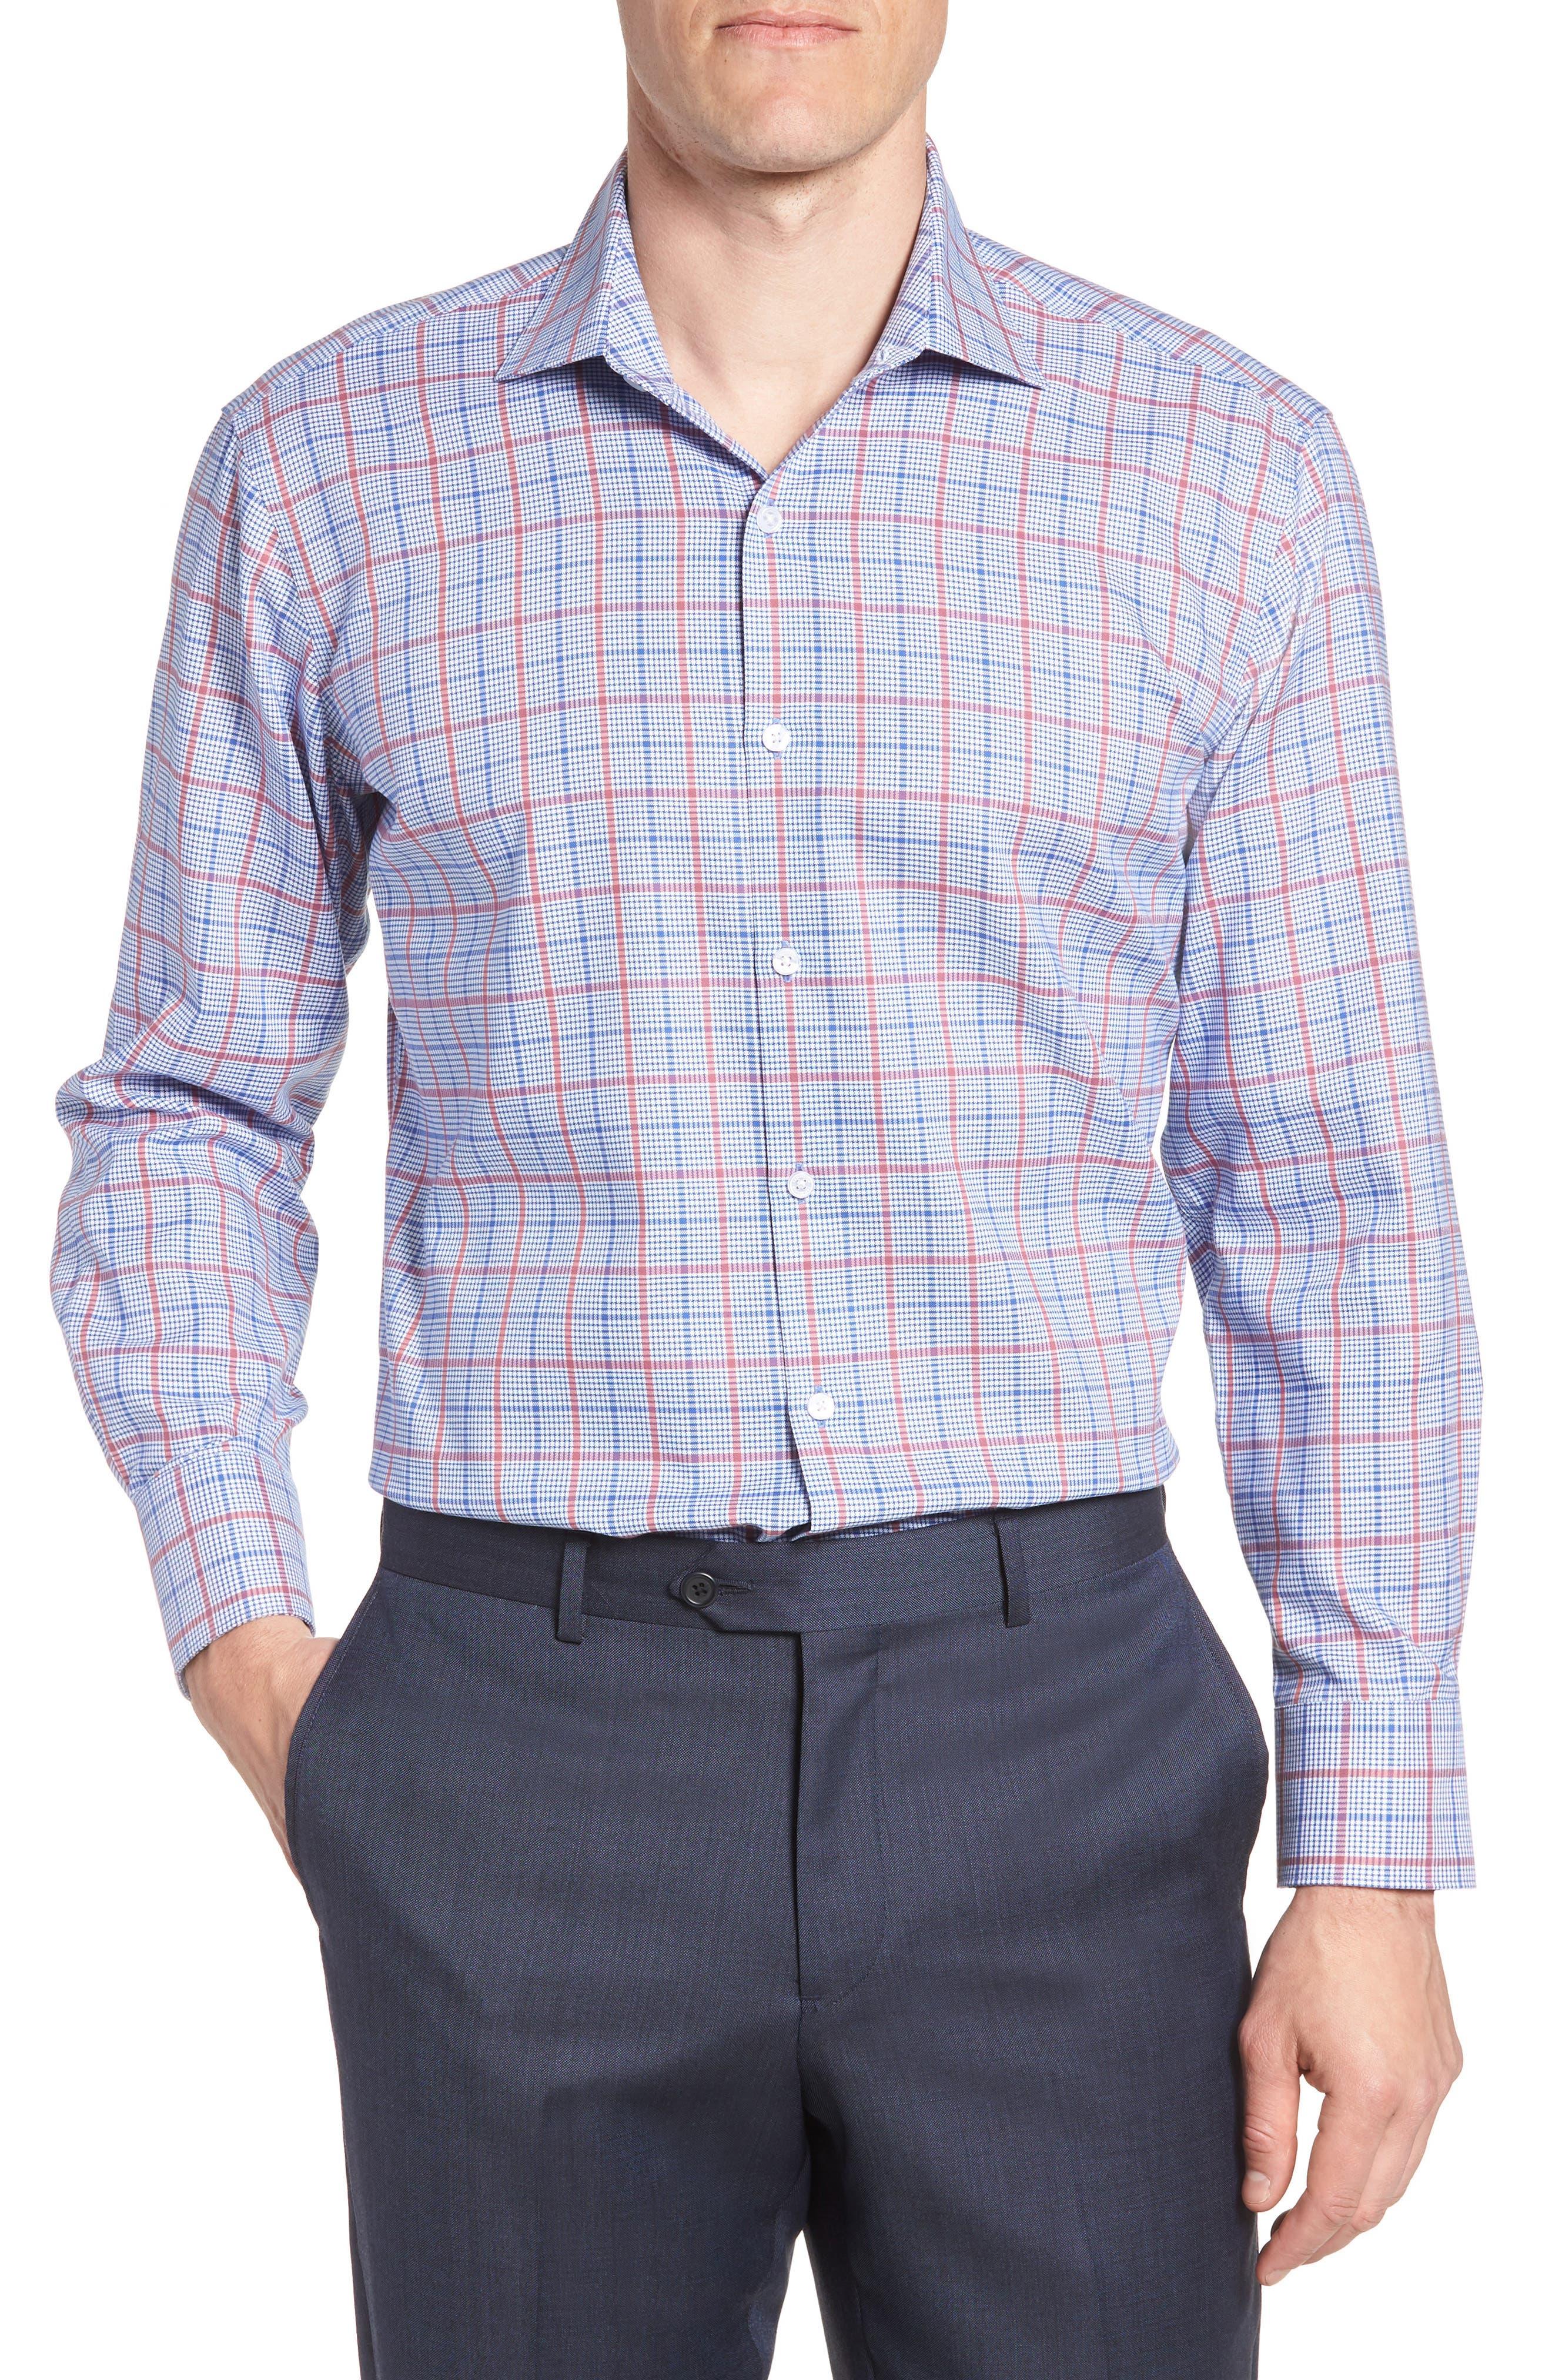 Kai Trim Fit Check Dress Shirt,                         Main,                         color, 400